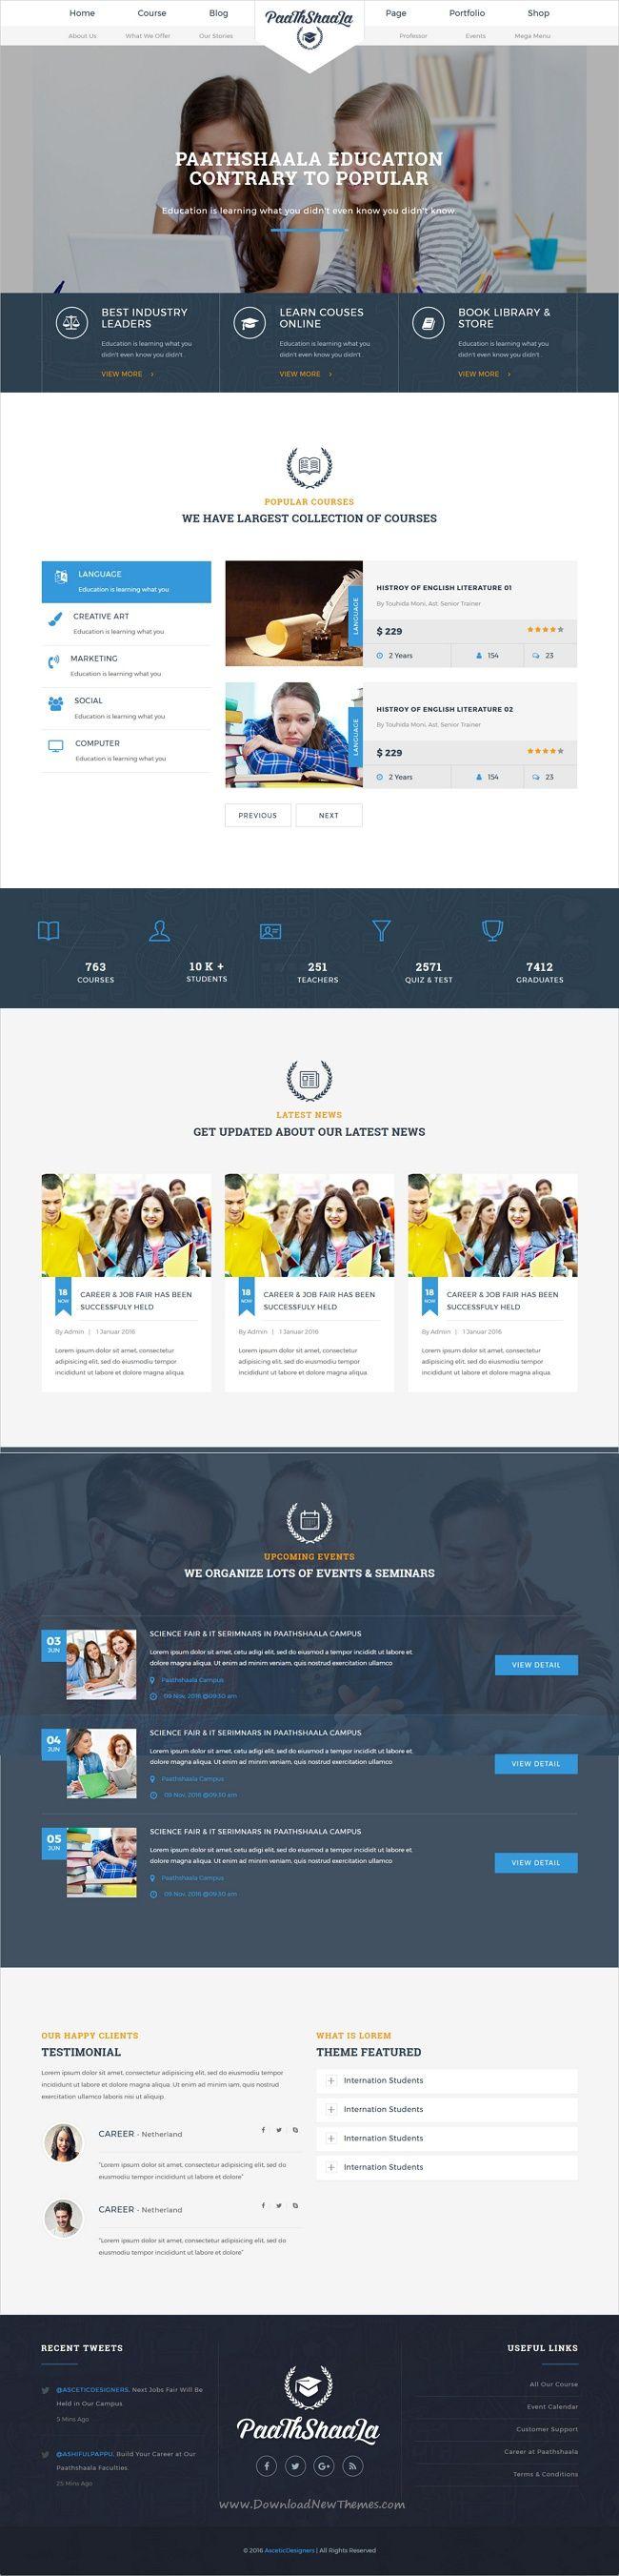 Best 25 website template ideas on pinterest business website paathshaala education website template pronofoot35fo Choice Image